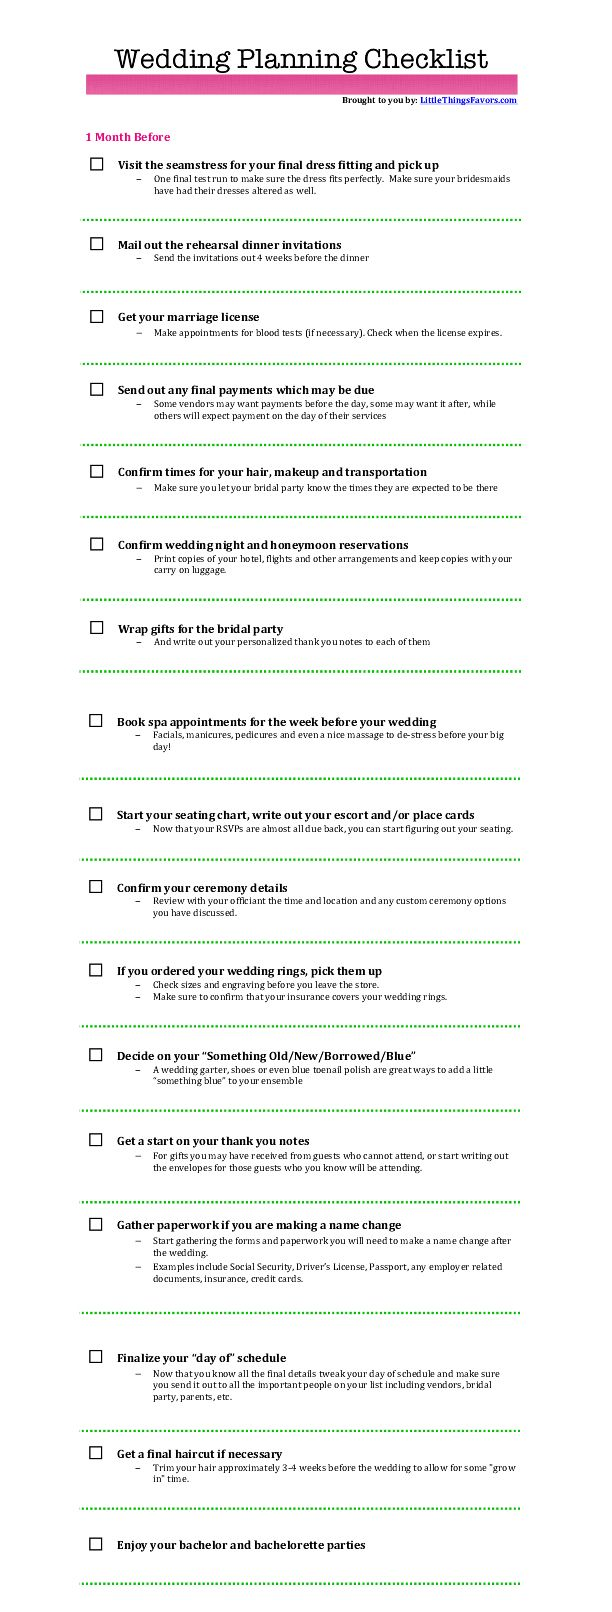 free printable wedding planning checklist 1 month before